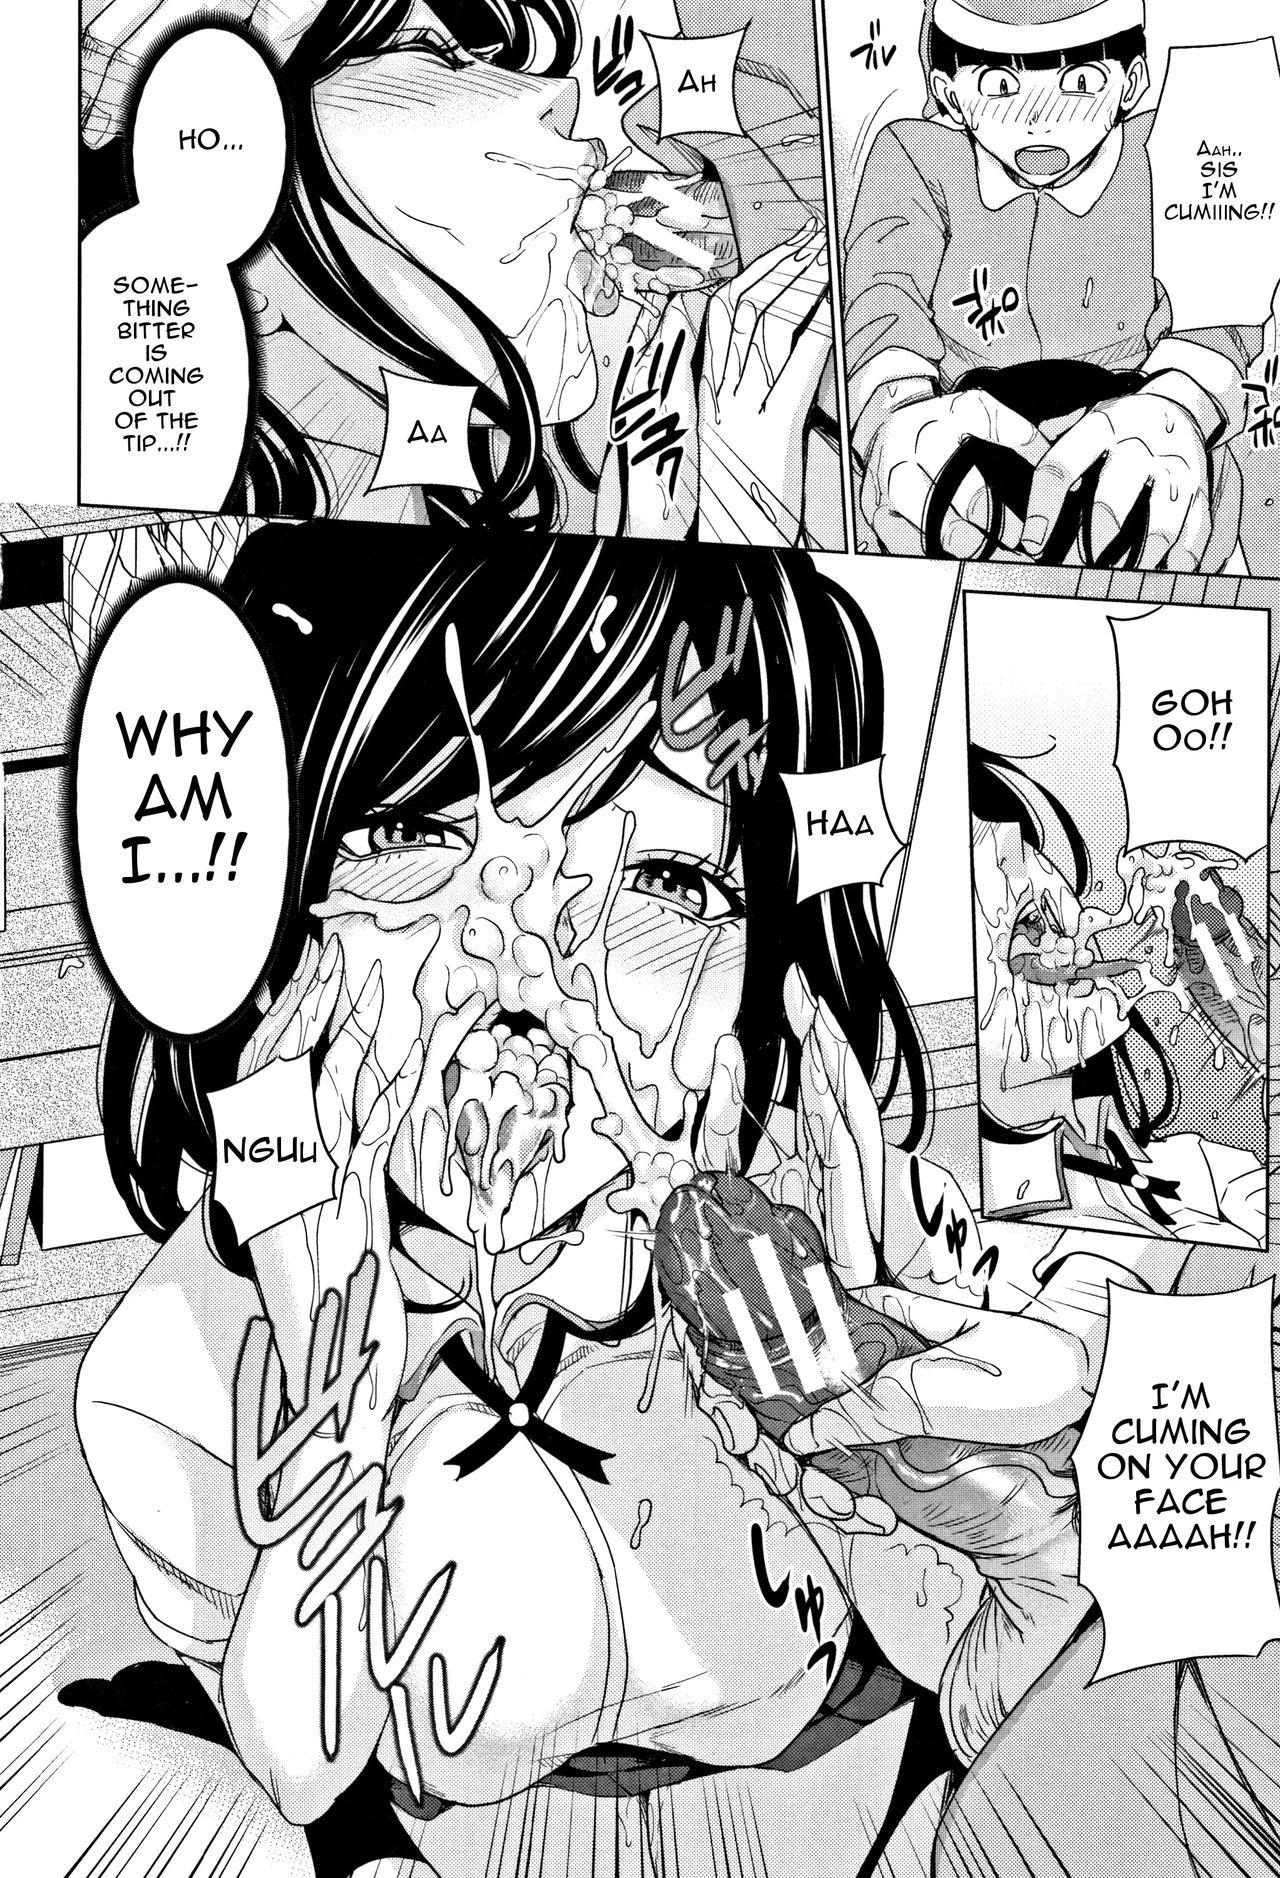 [Maimu-Maimu] Kazoku Soukan Game - family Incest game Ch. 1-3 [English] [Januz] 46